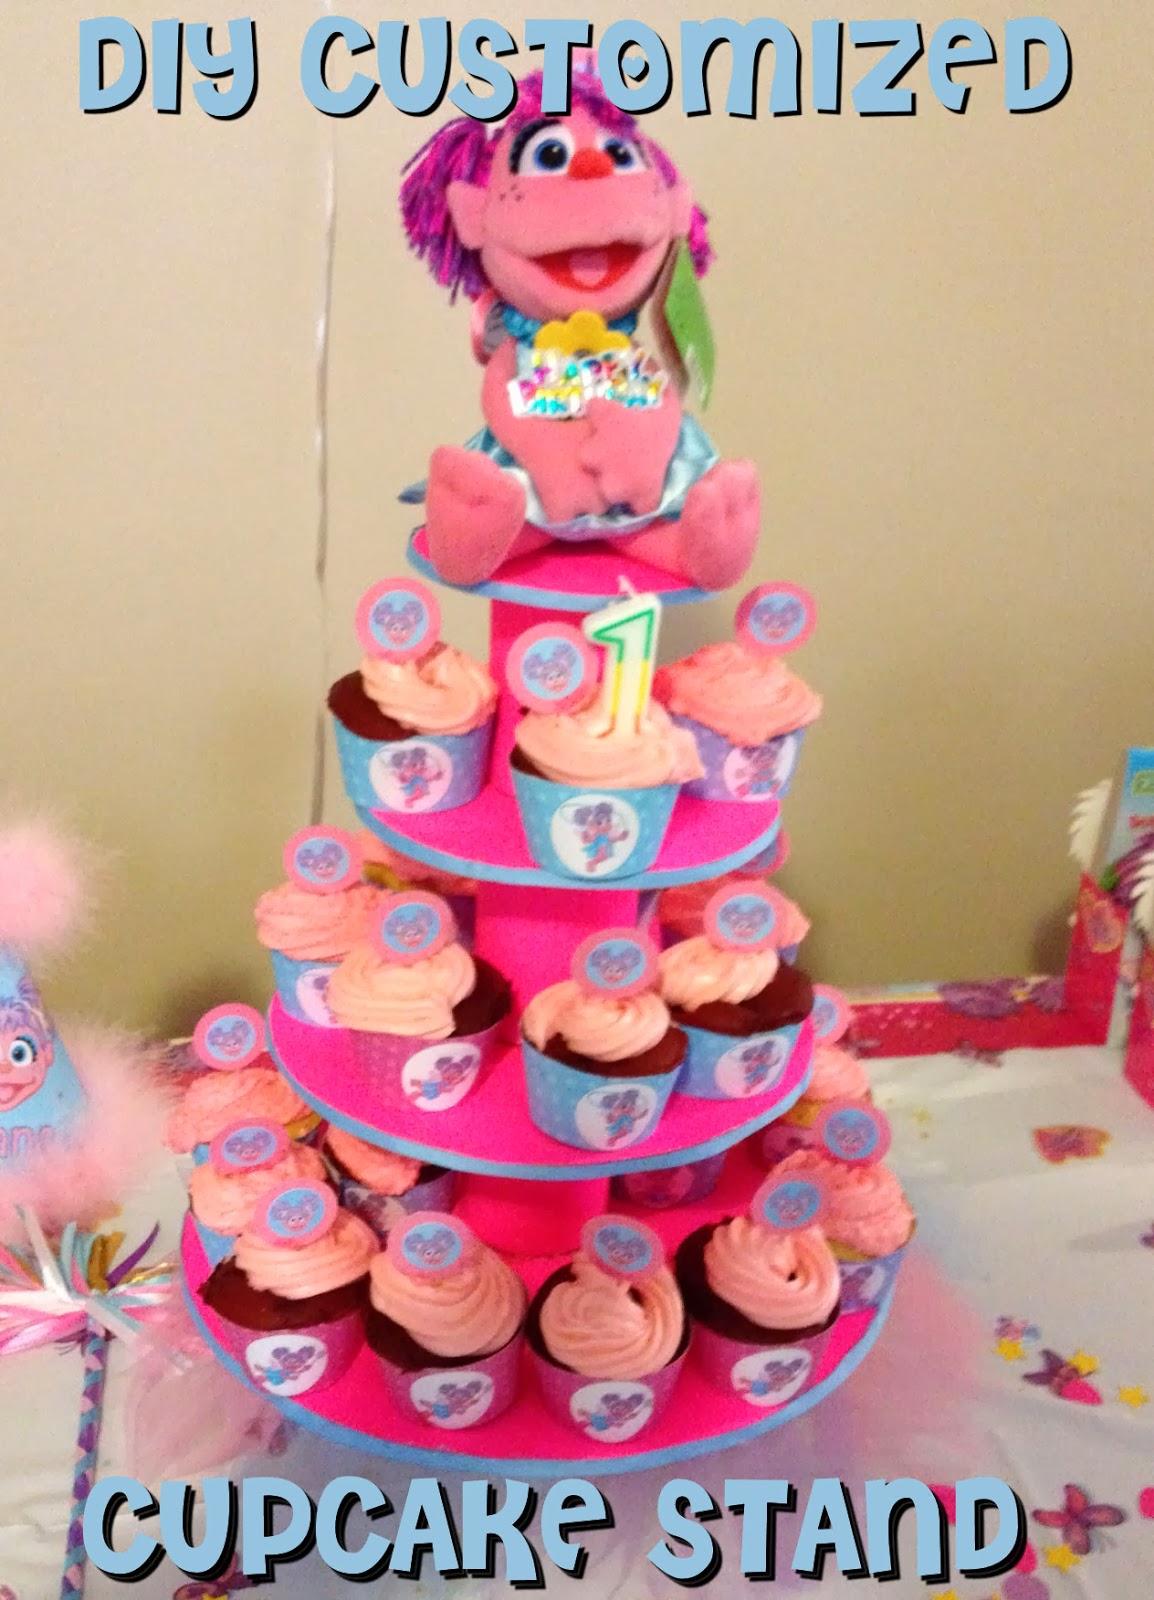 DIY Abby Cadabby Birthday Party Customized Cupcake Stand Tutorial